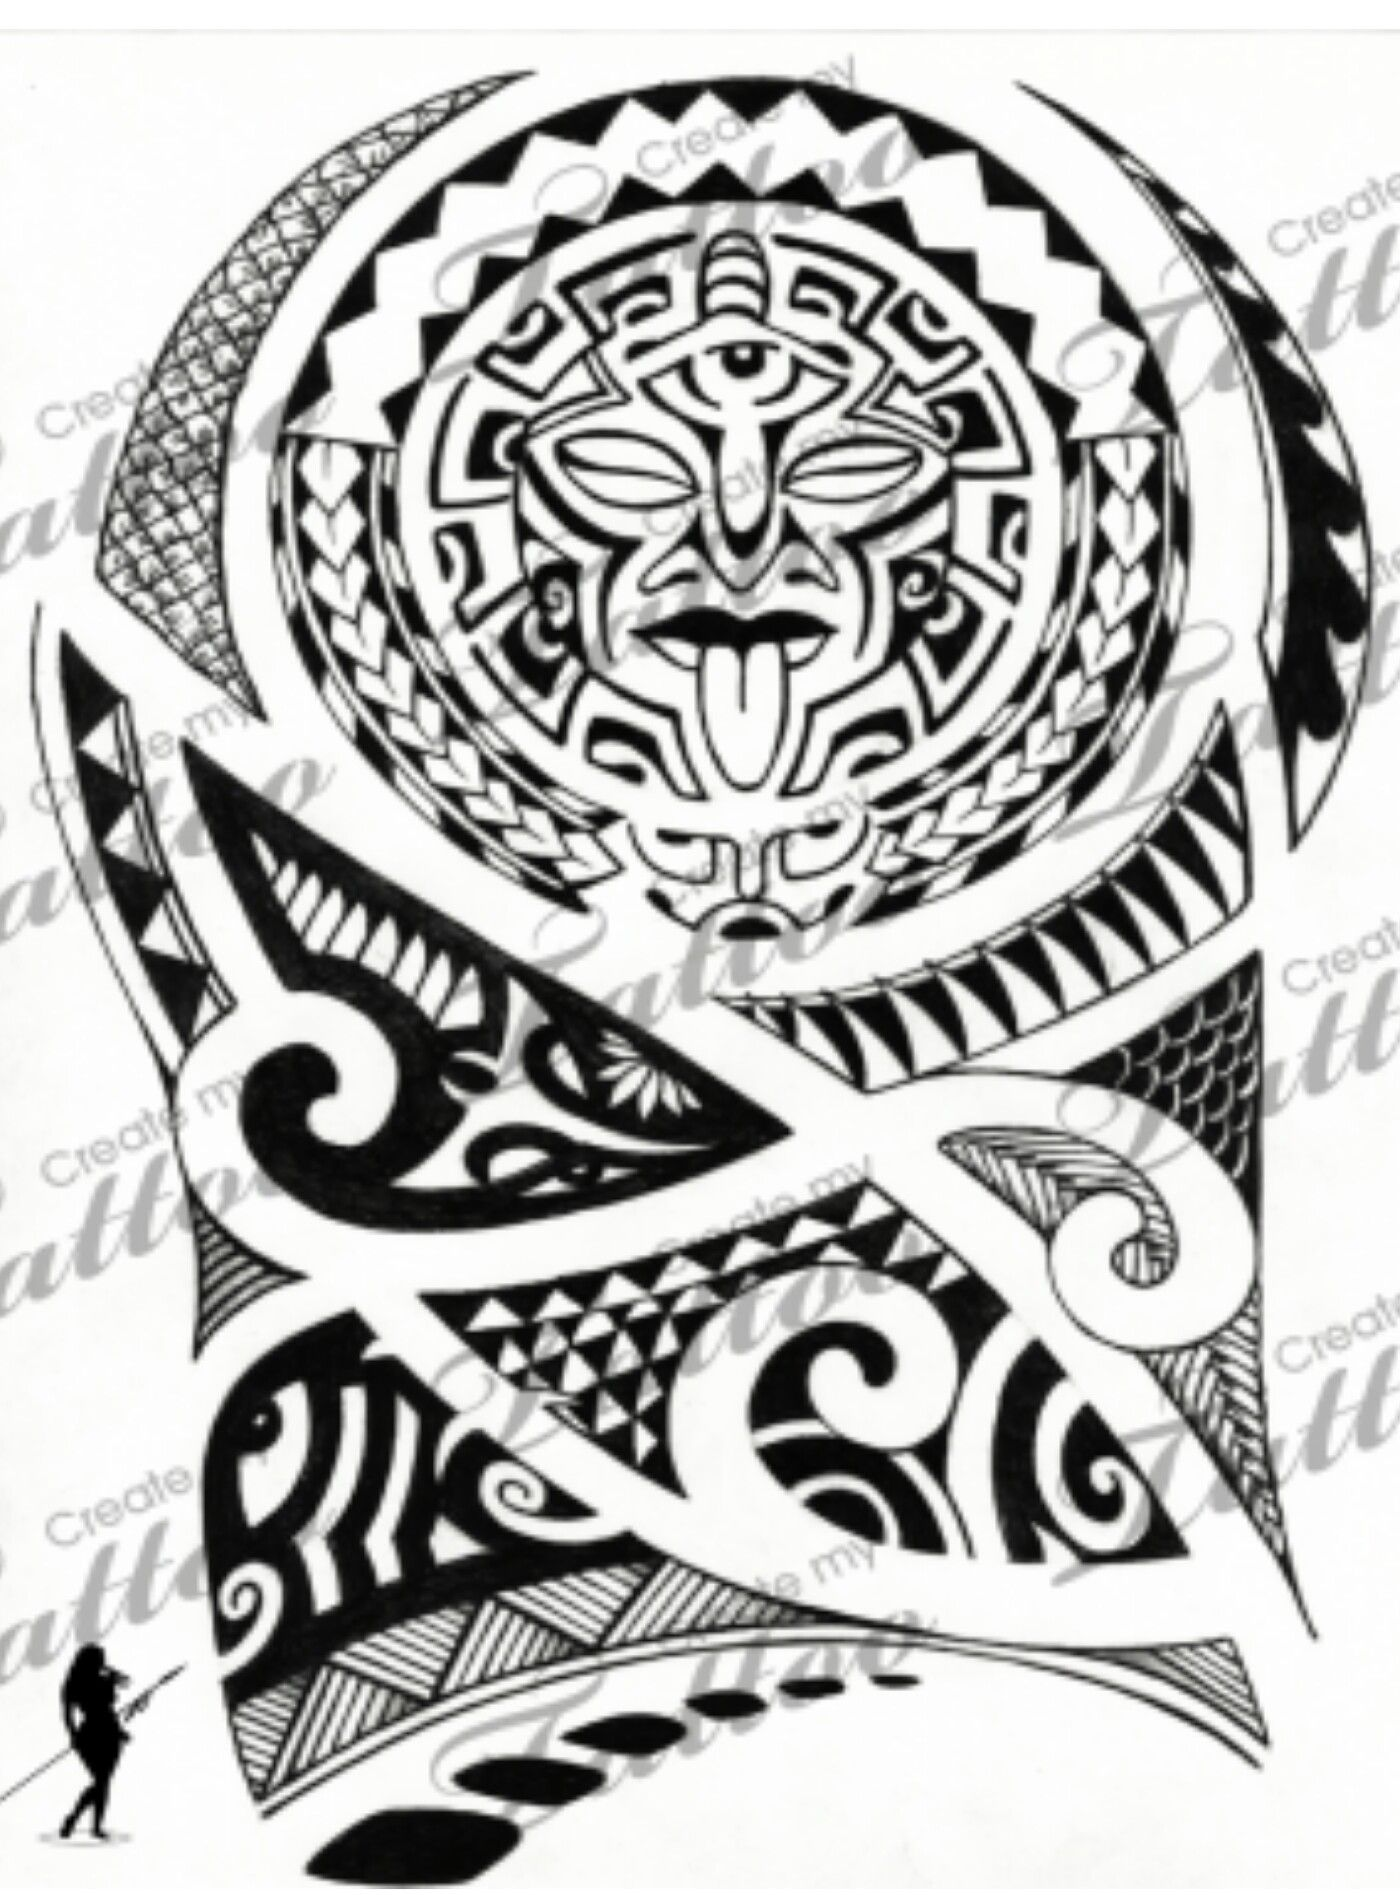 Favoritos Pin by Lim Wc on tattoos | Pinterest | Maori, Tattoo and Tatoo EN47